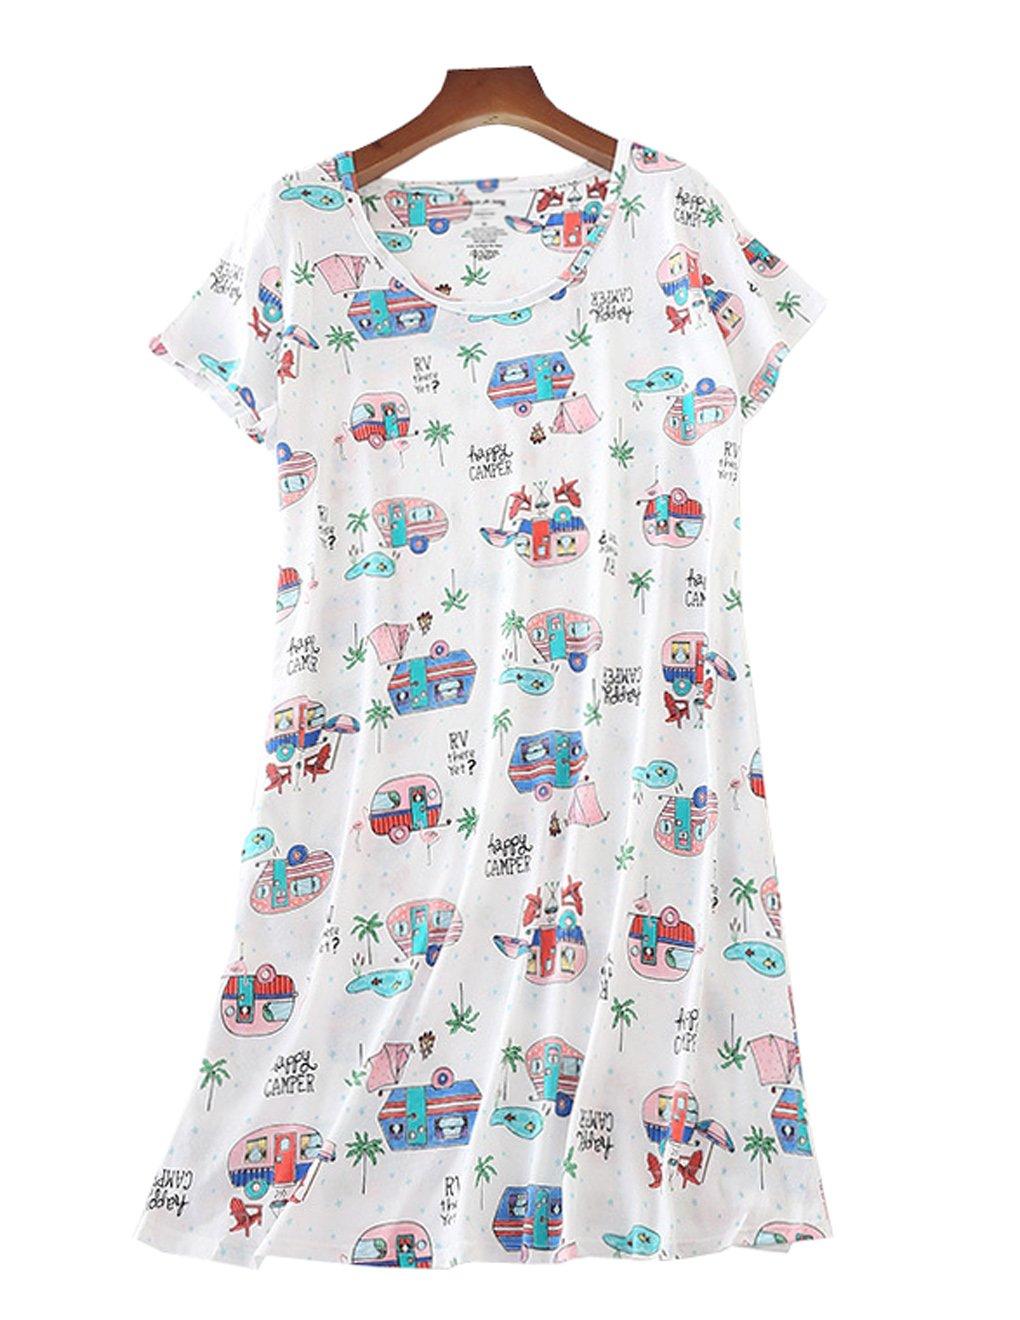 VENTELAN Women Nightgown Cute Short Sleeve Summer Sleepwear Dress Cotton Pajama